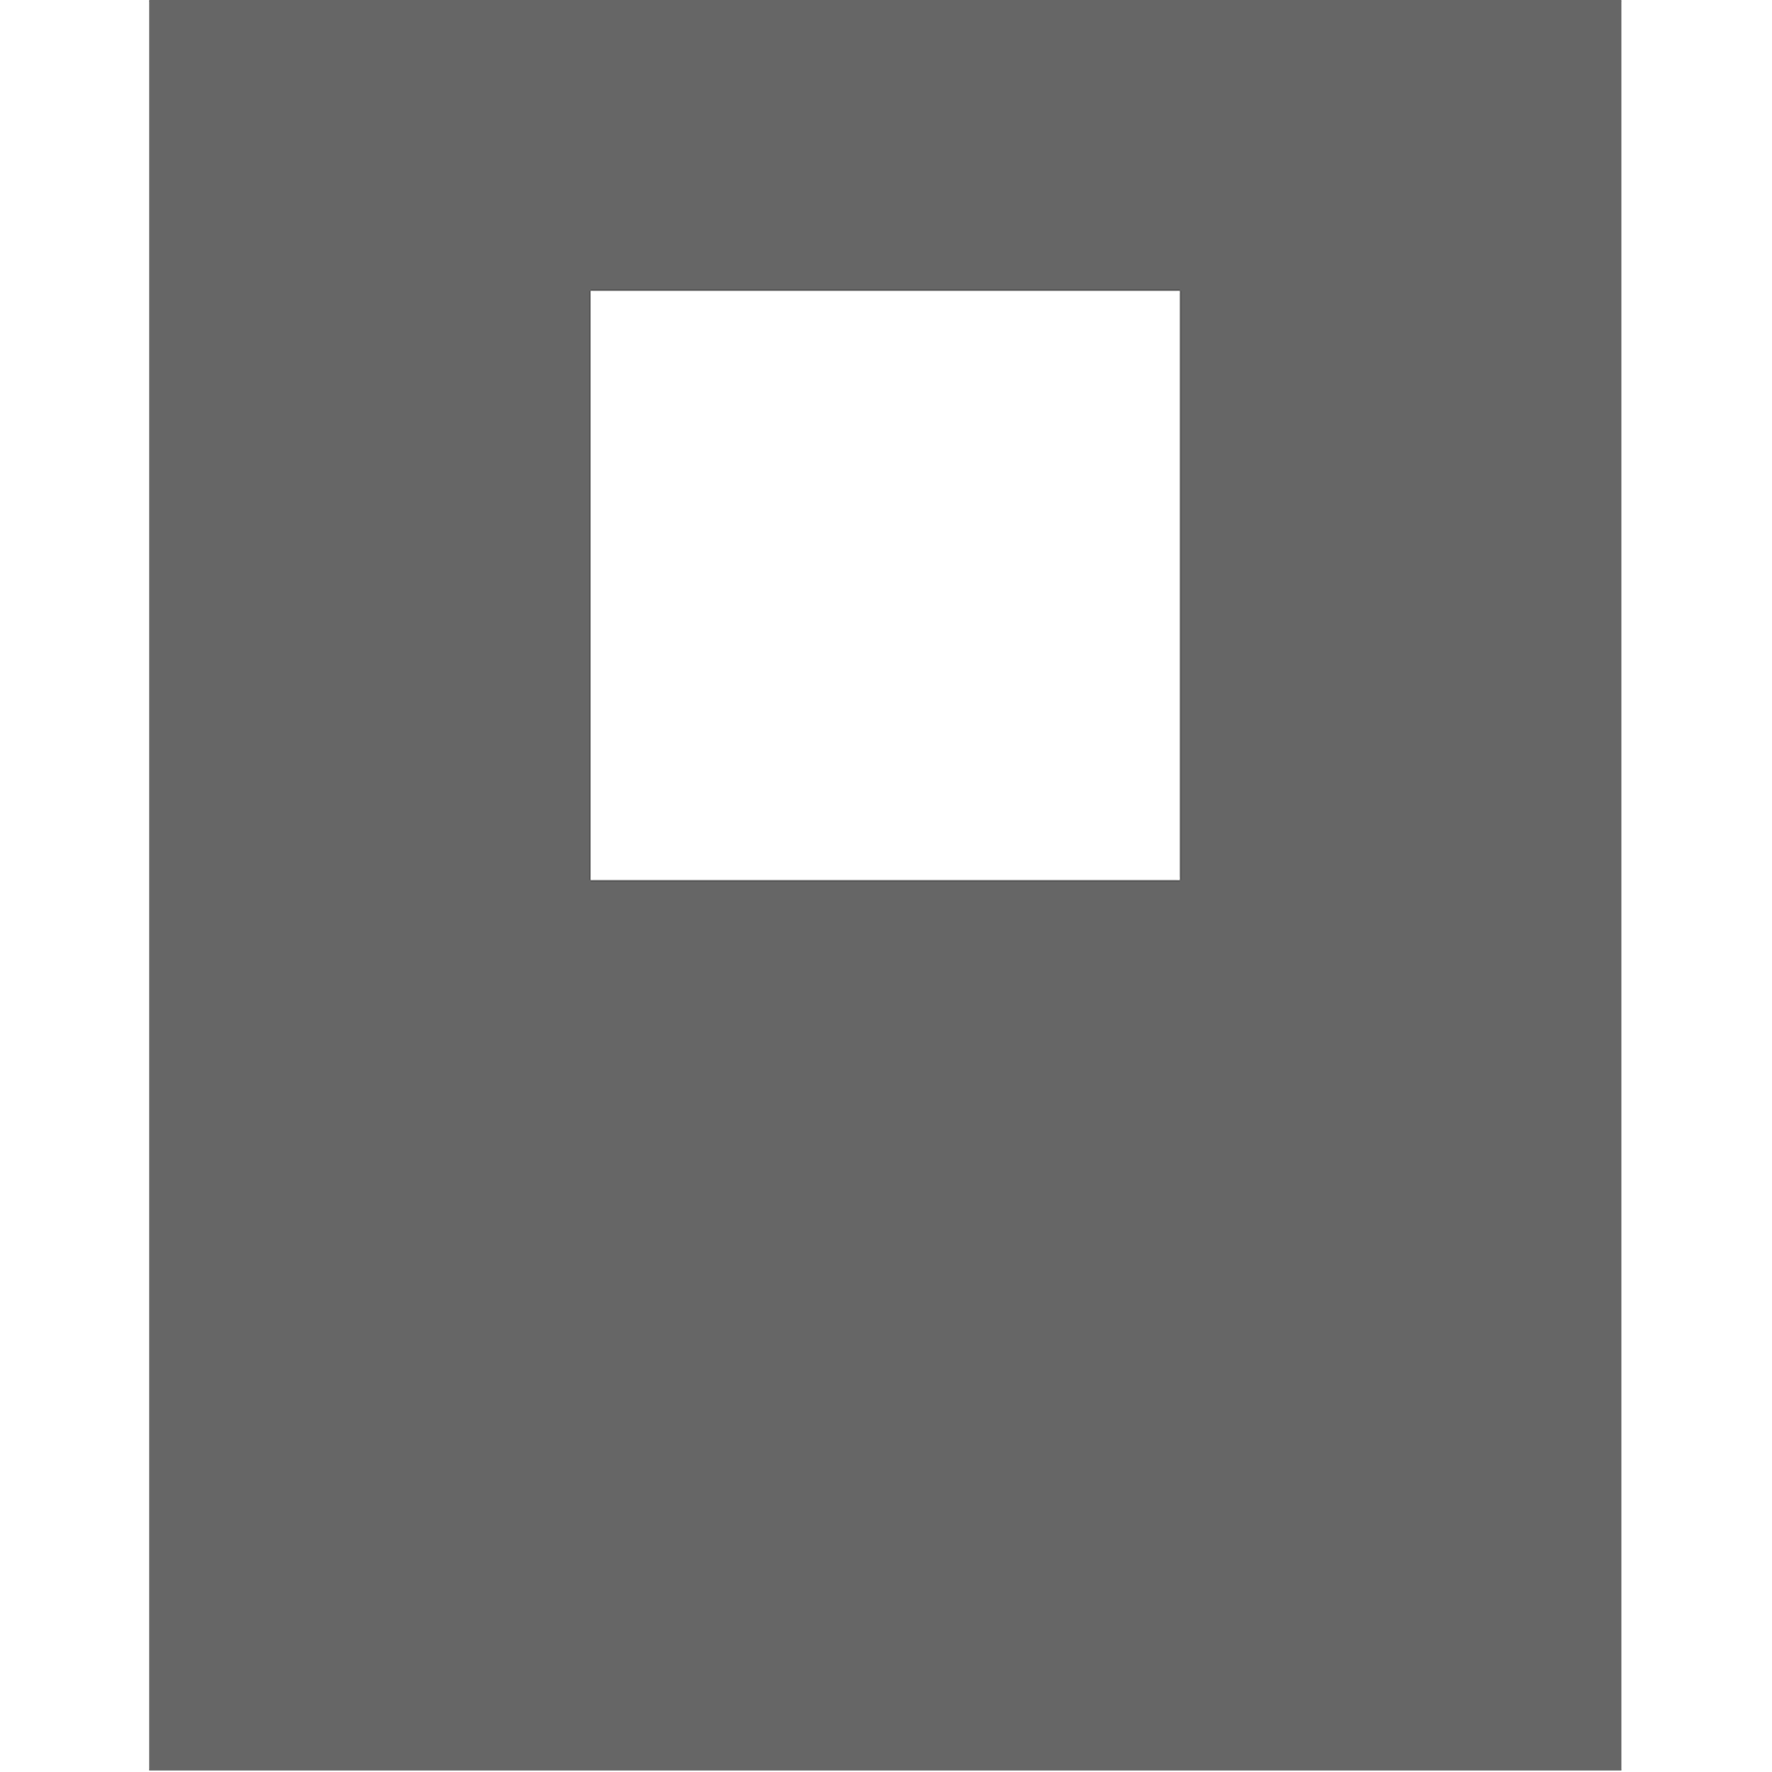 P1-pasp 10x10cm